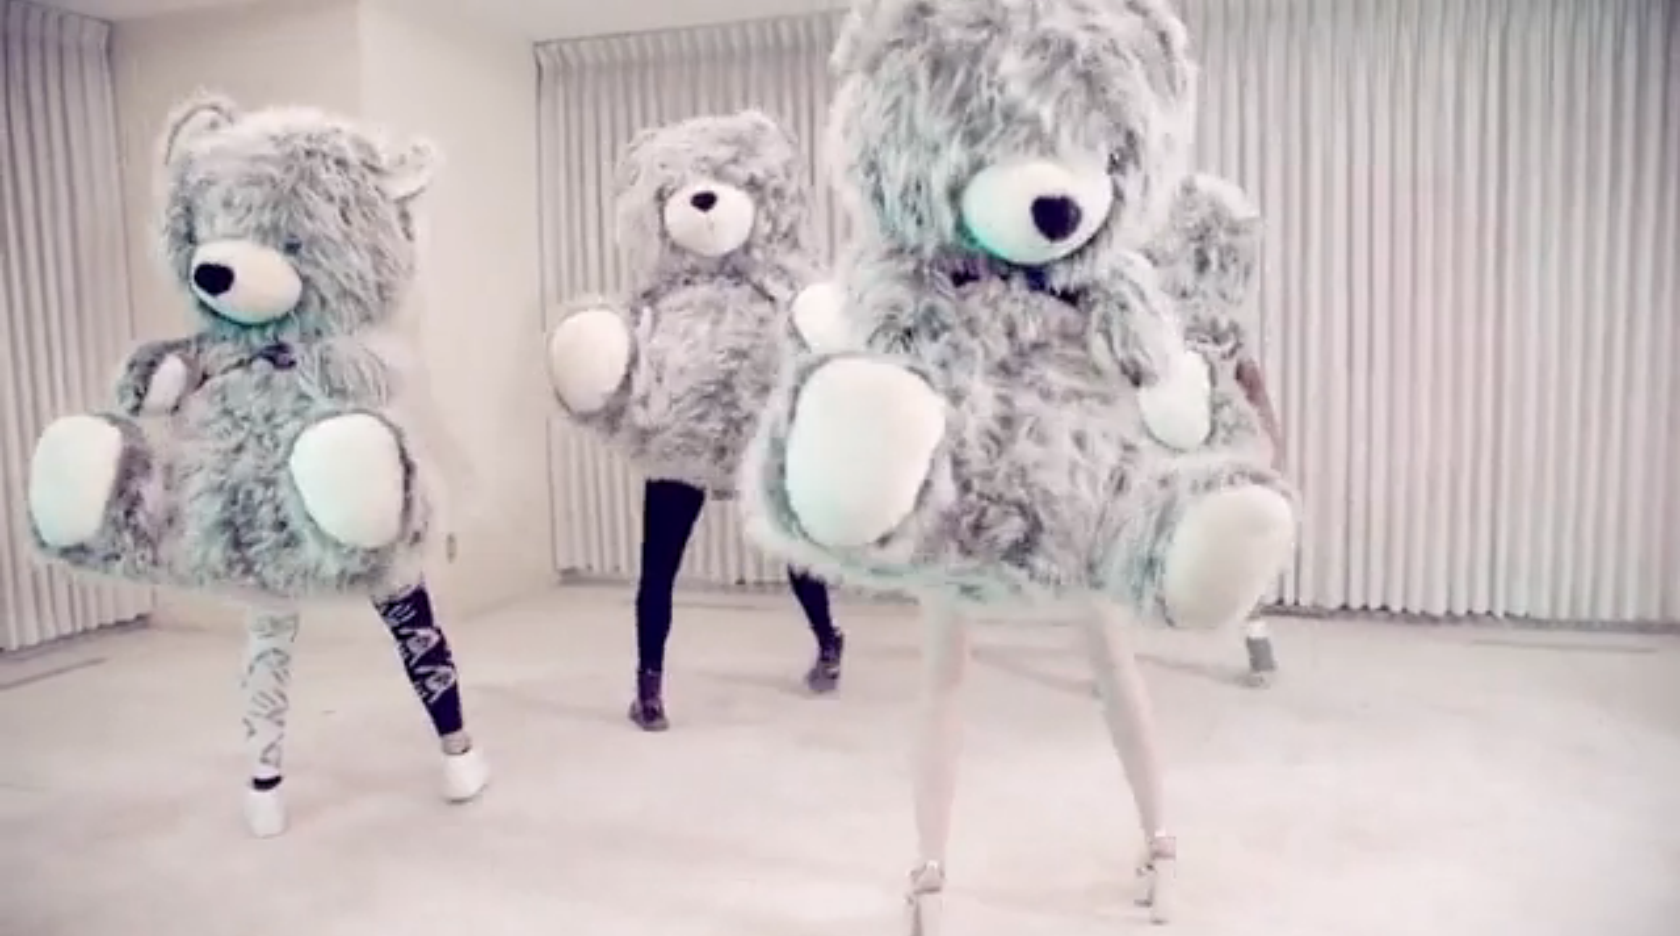 Miley Cyrus Musikvideo ohne Musik macht Albträume